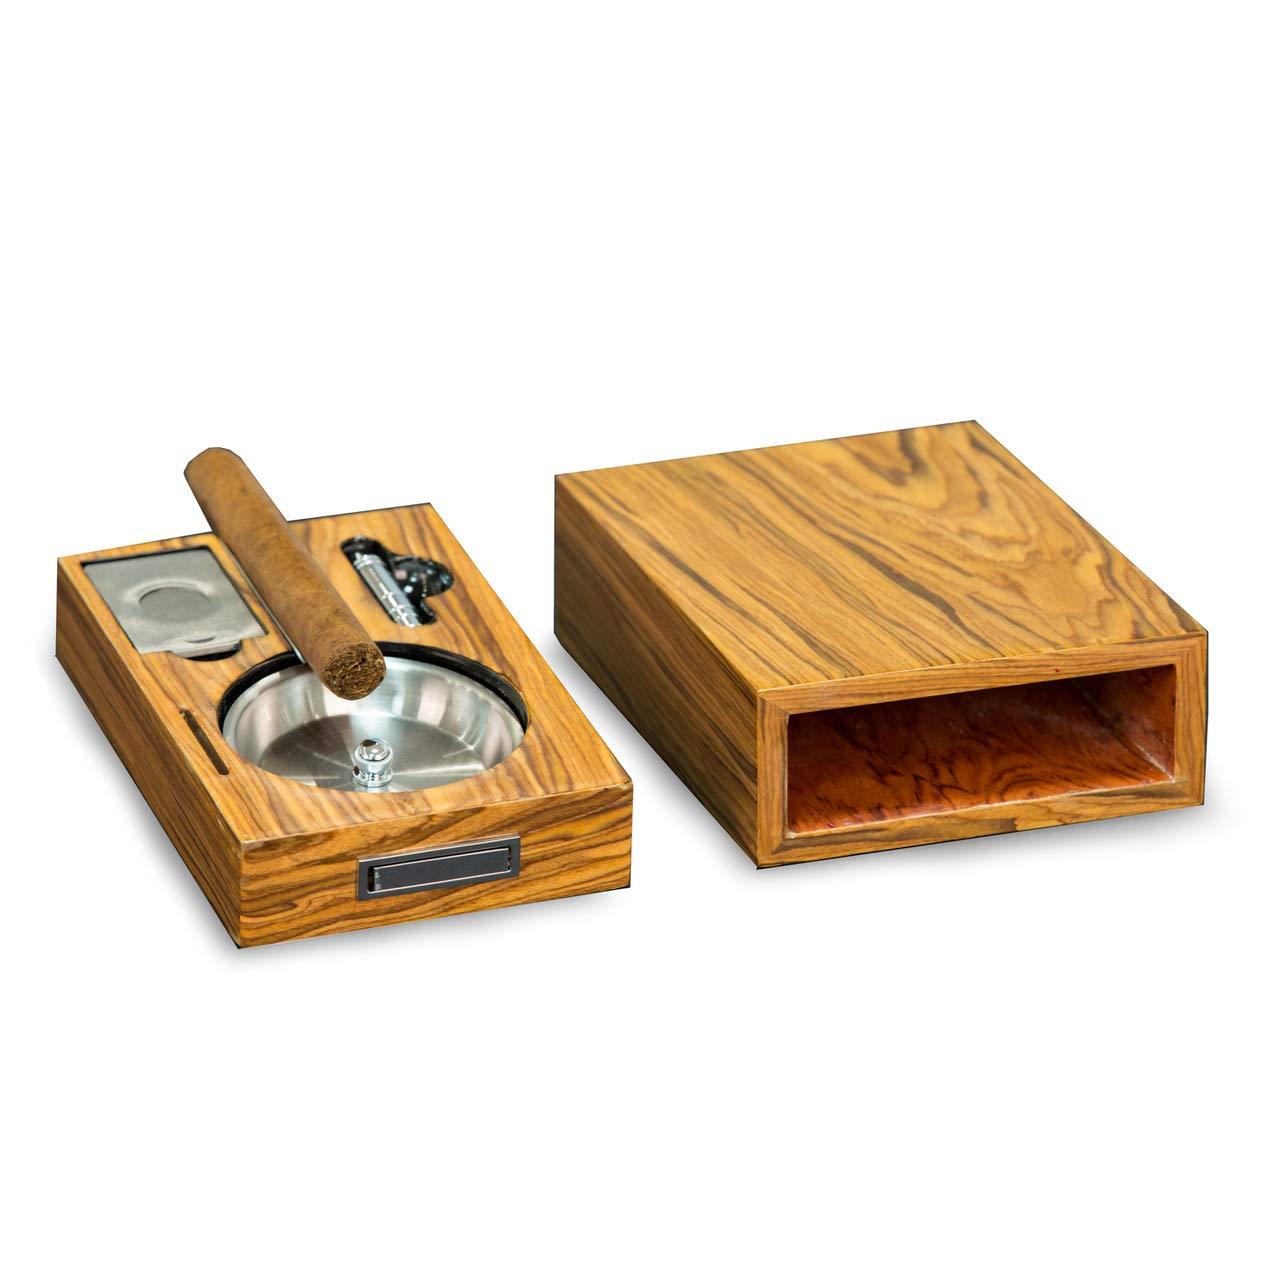 Bey-Berk Cigar Ashtray/Cutter/Punch Olive Wood Color by Bey-Berk